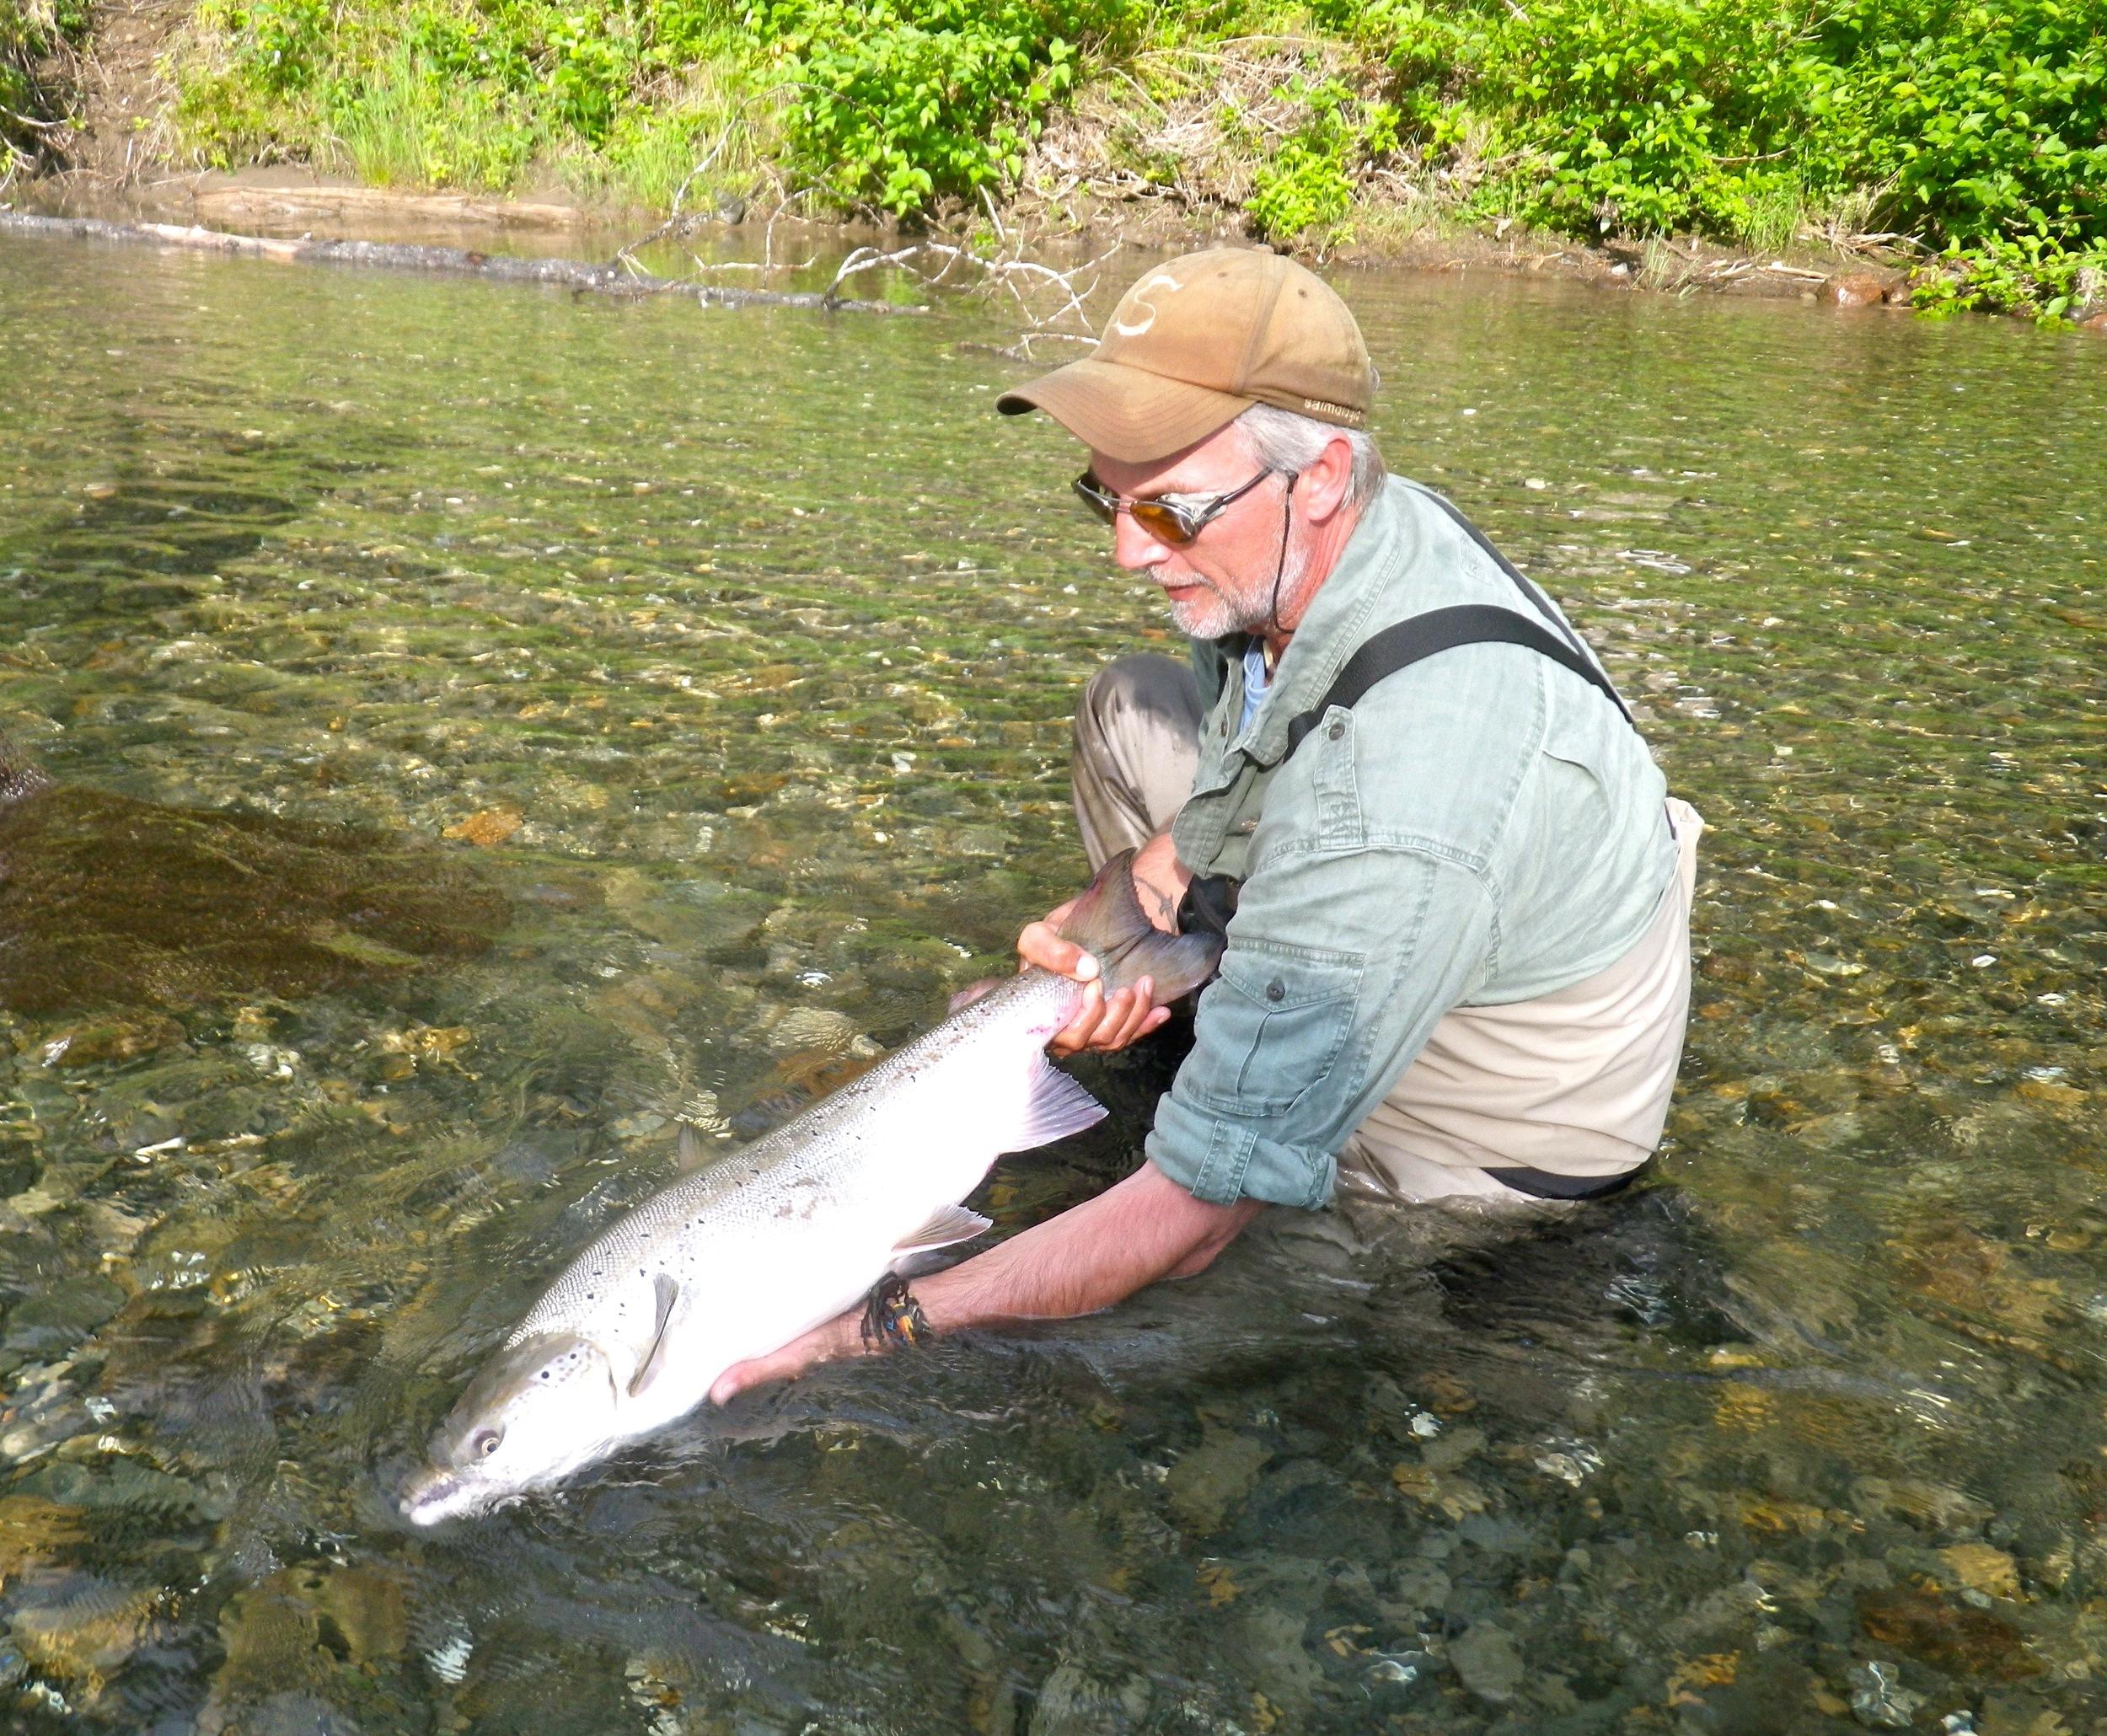 Henrik Mortensen lands his first Bonaventure salmon of the season, Congratulations Henrik, nice salmon!